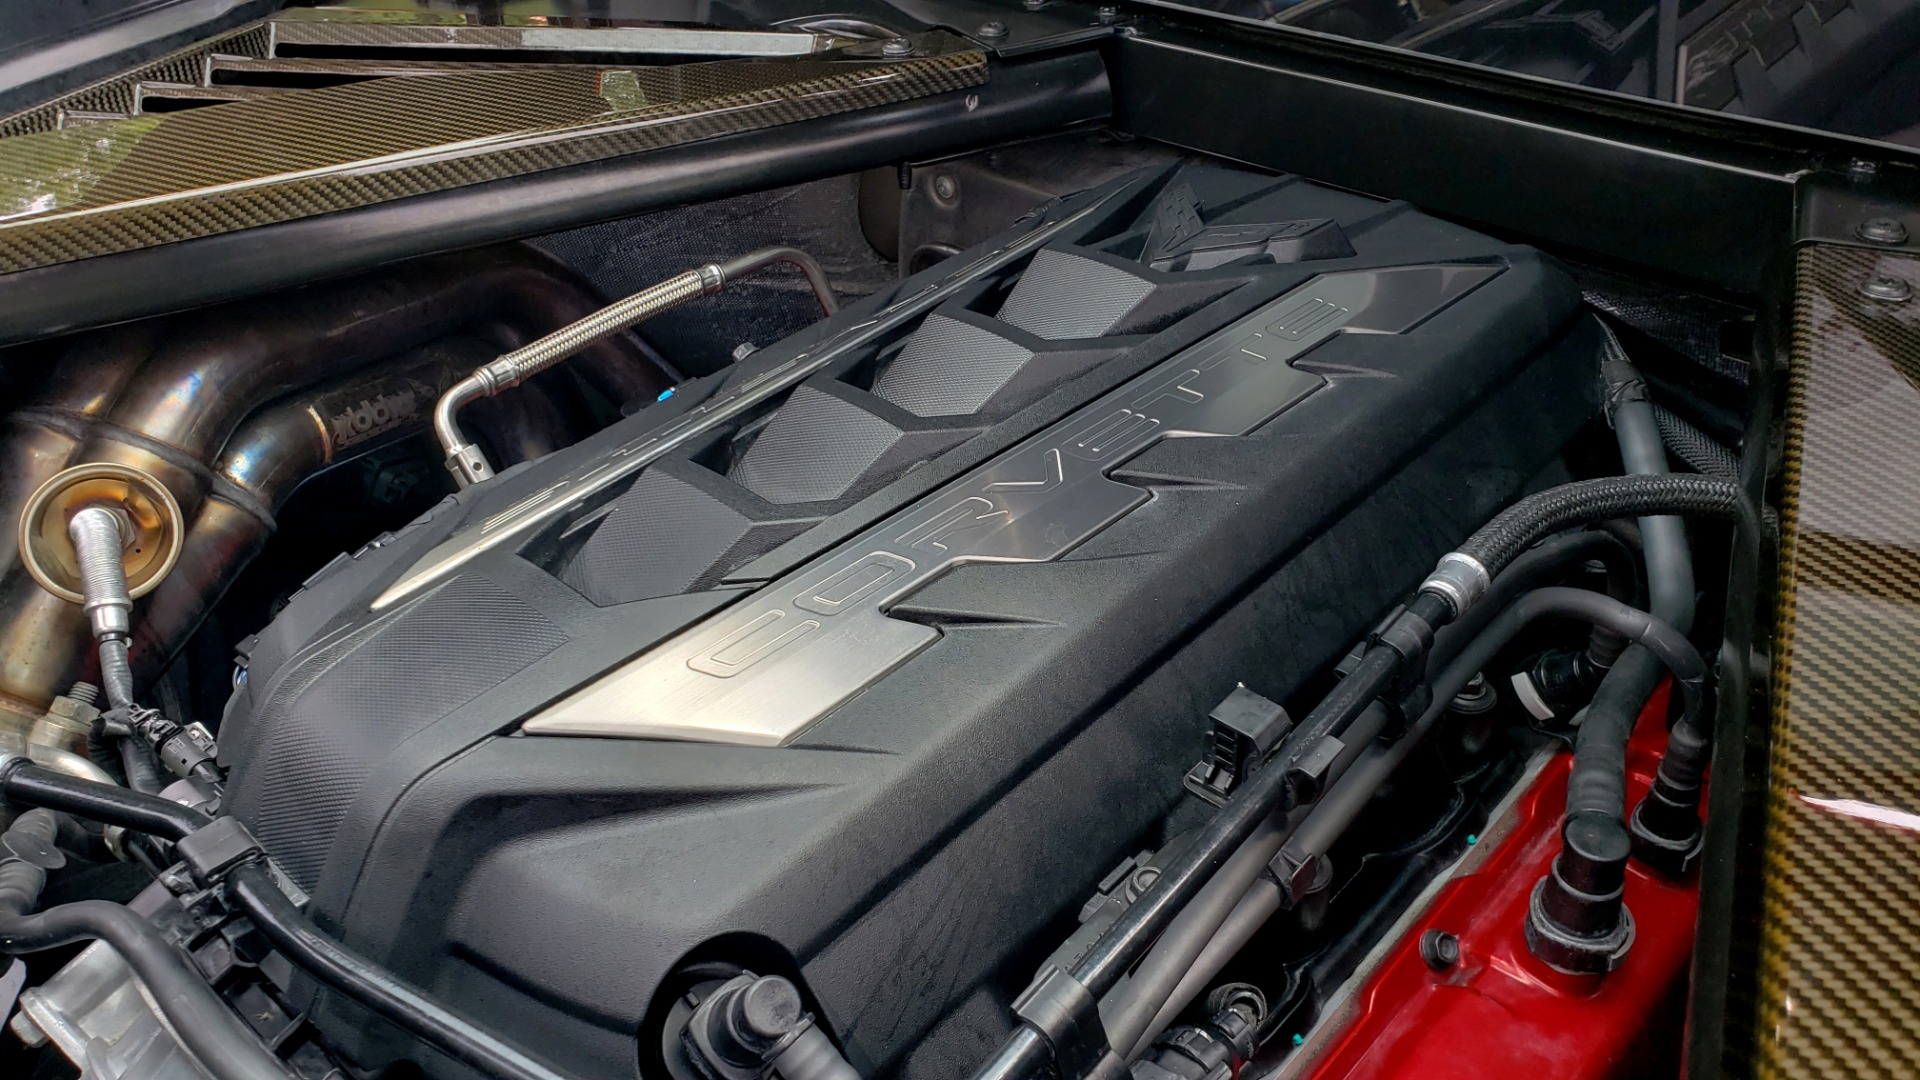 Used 2020 Chevrolet CORVETTE C8 STINGRAY 2LT / 6.2L V8 / 8-SPD AUTO / NAV / BOSE / REARVIEW / DATA RECOR for sale Sold at Formula Imports in Charlotte NC 28227 25